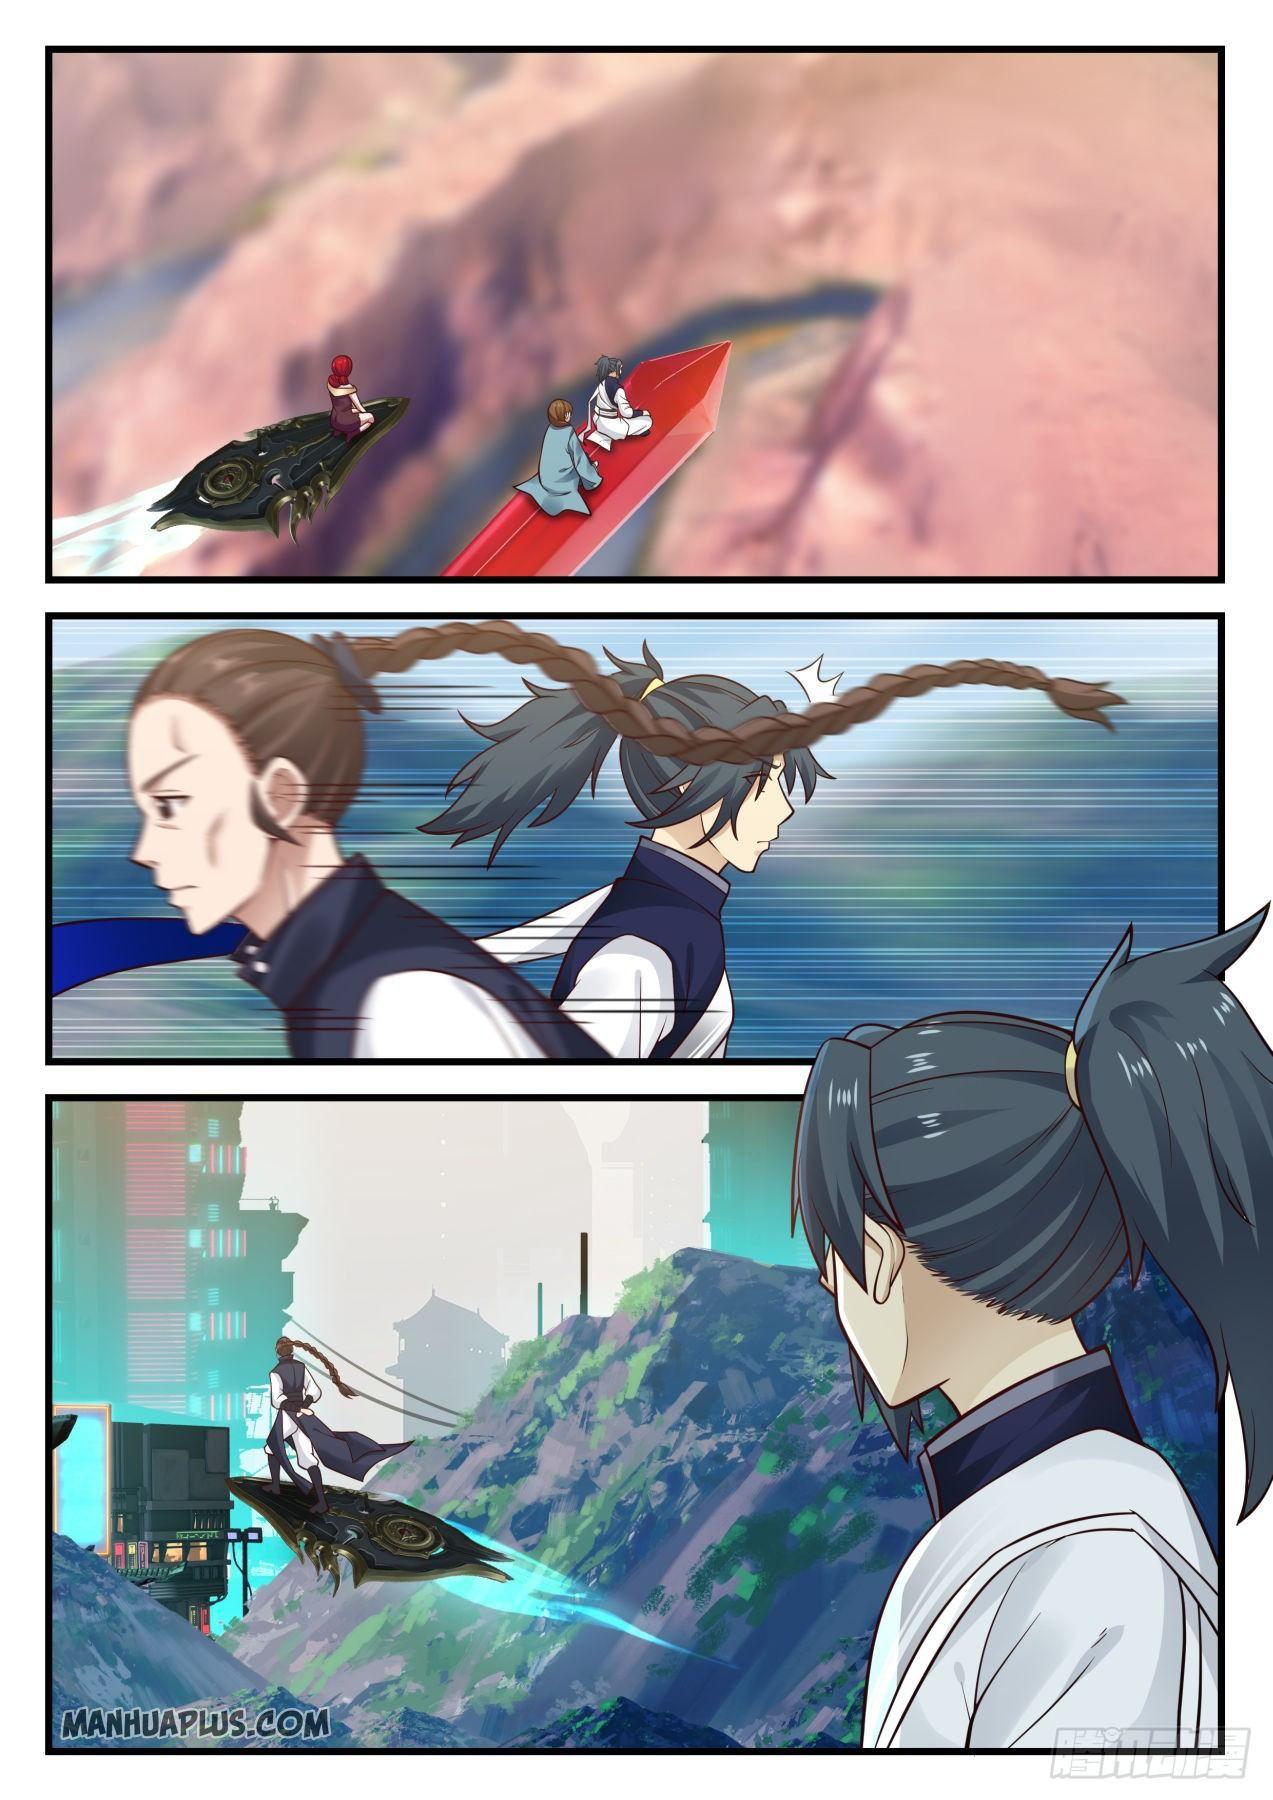 Martial Peak - chapter 902-eng-li